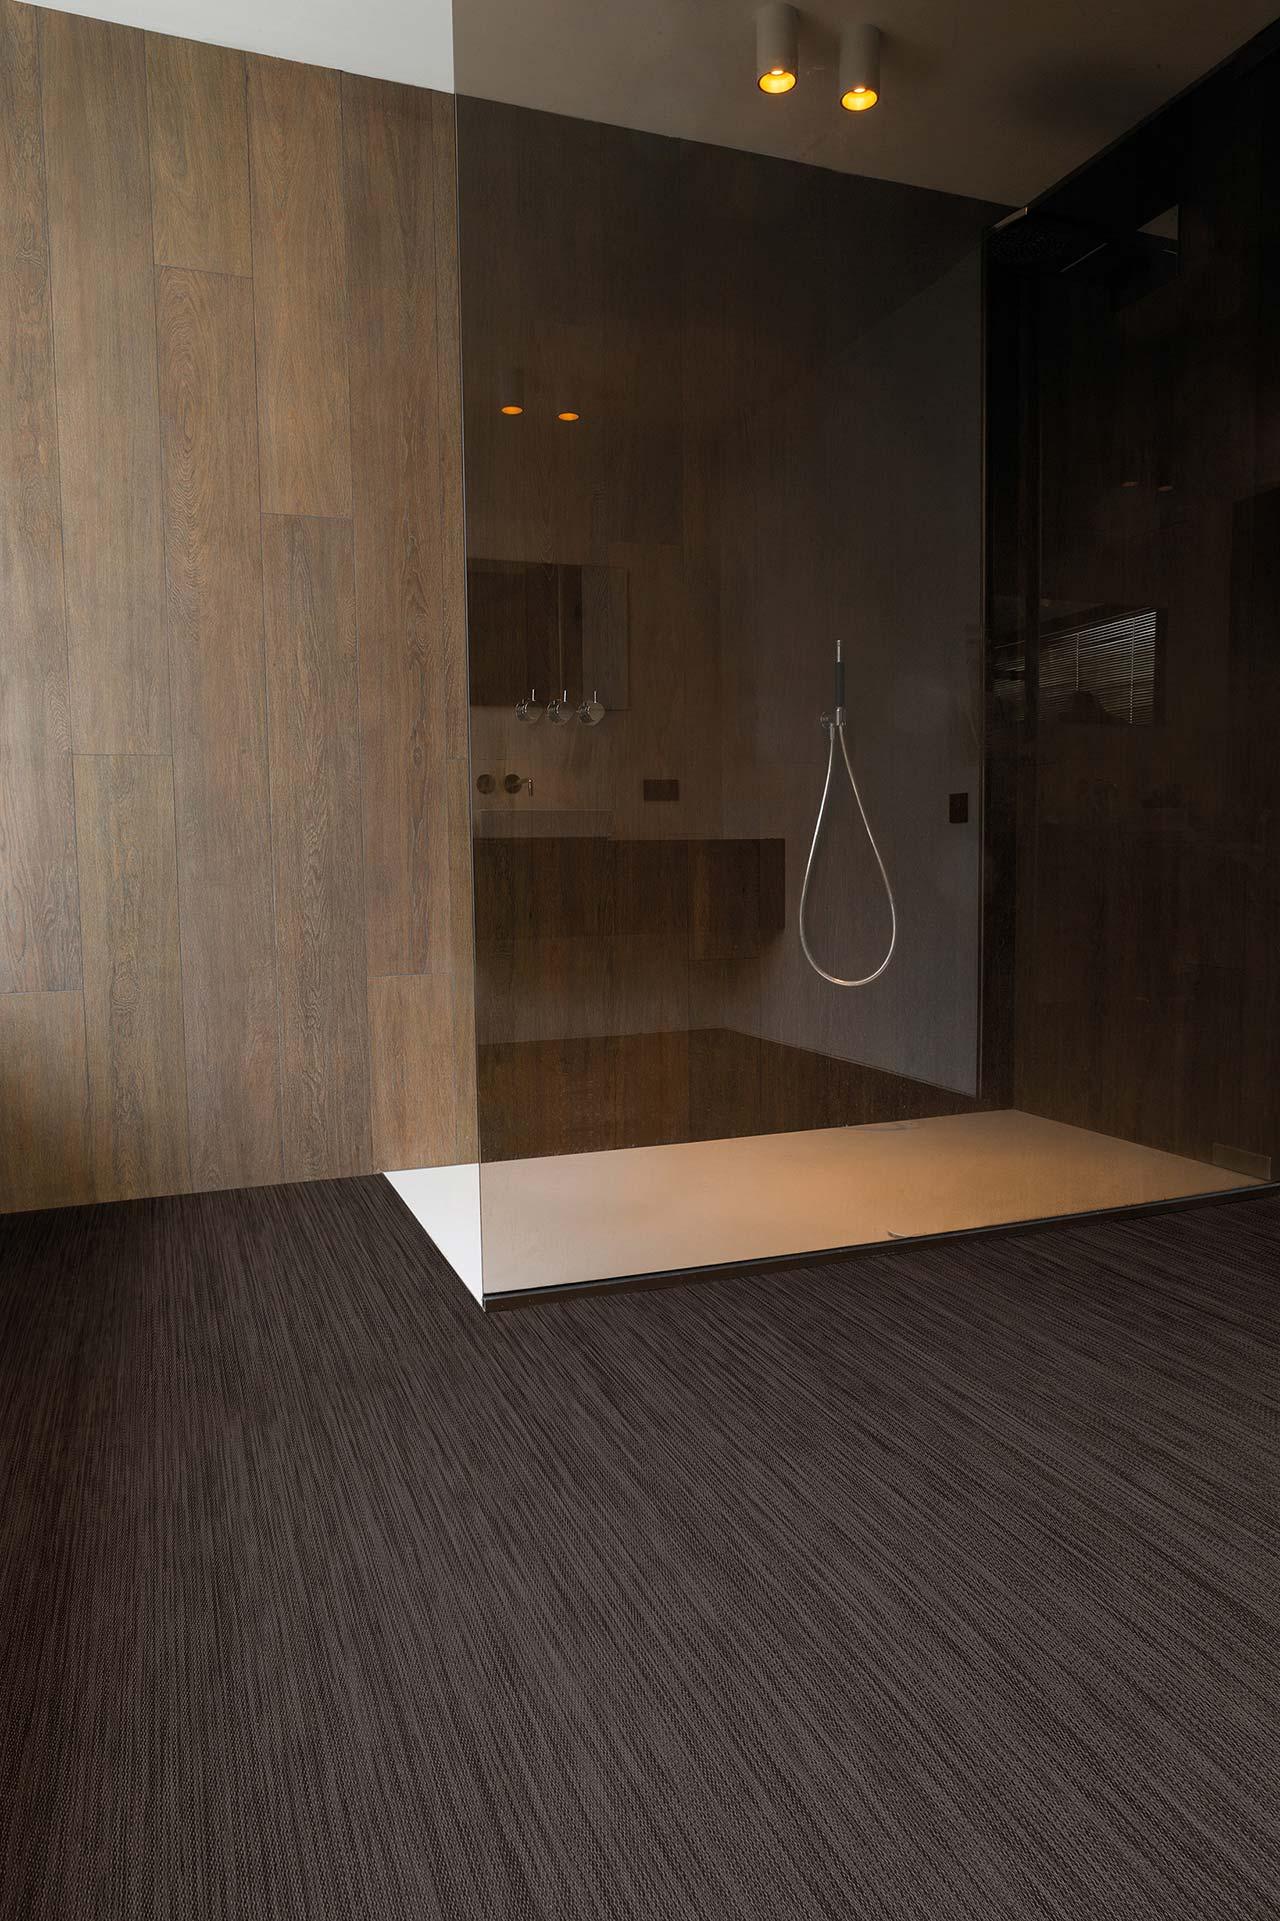 extreme_licorice_sfeerbeeld_limited-edition_carpets.jpg